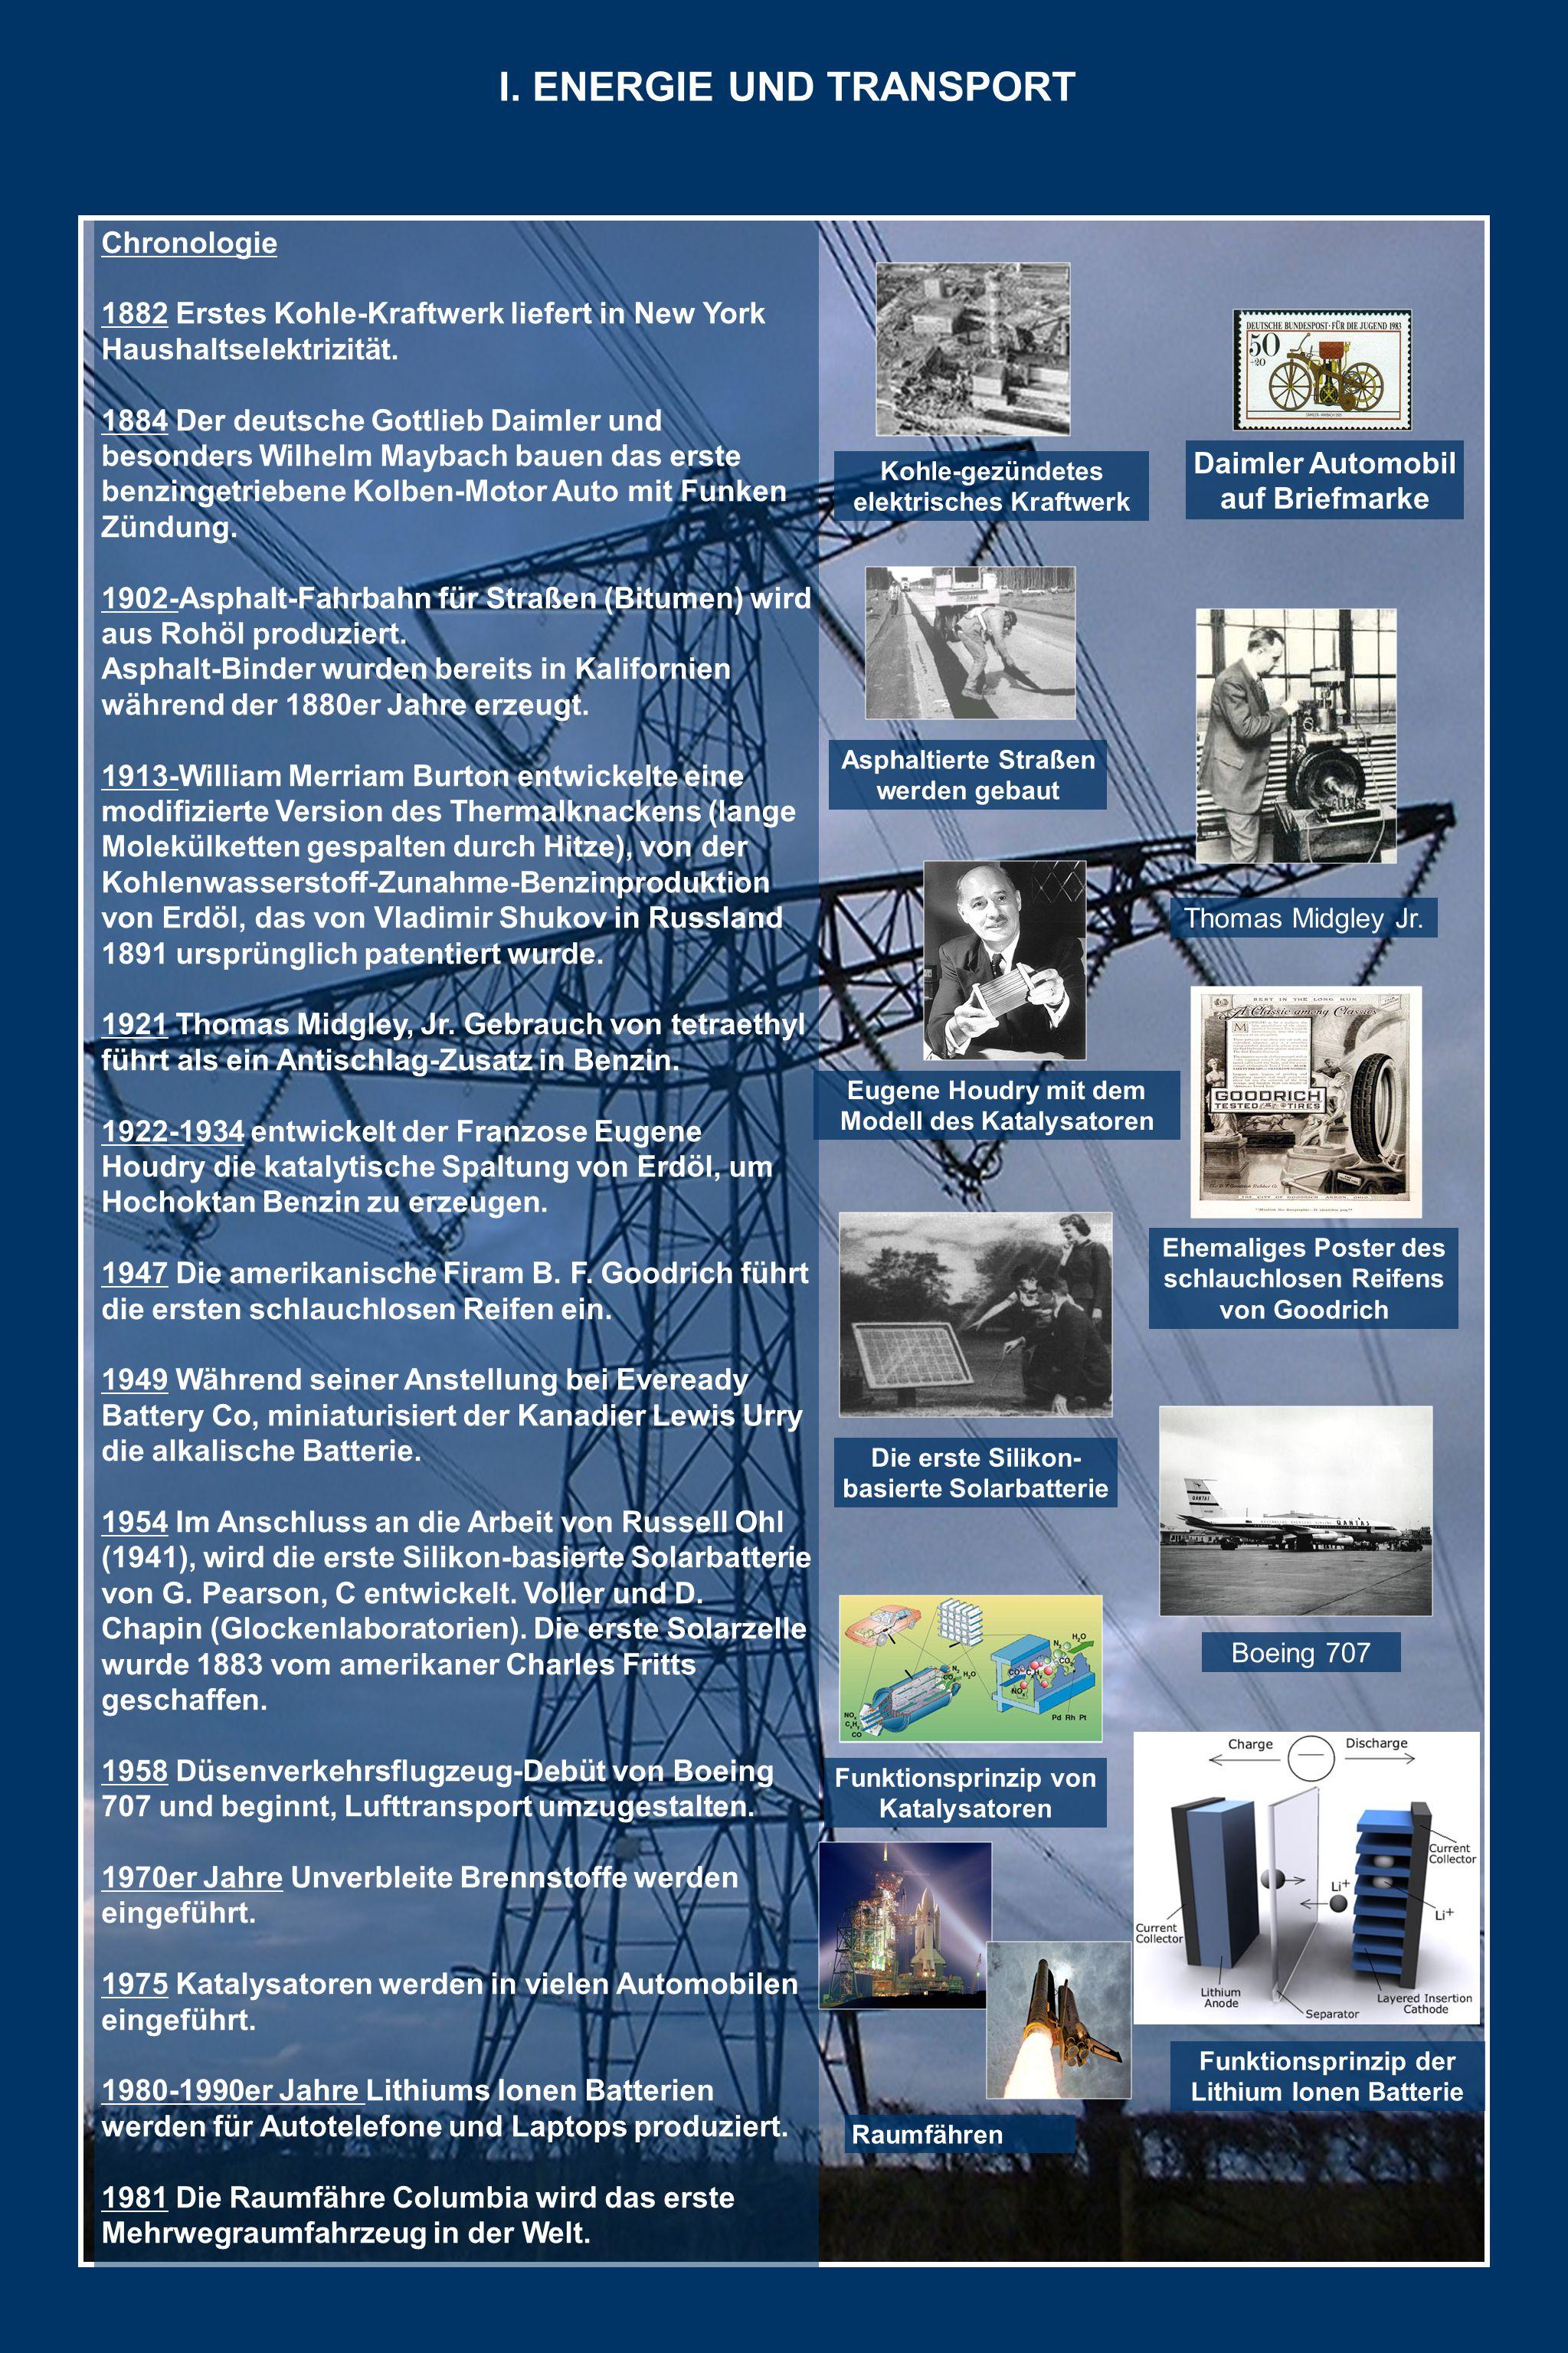 Chronologie 1882 Erstes Kohle-Kraftwerk liefert in New York Haushaltselektrizität.